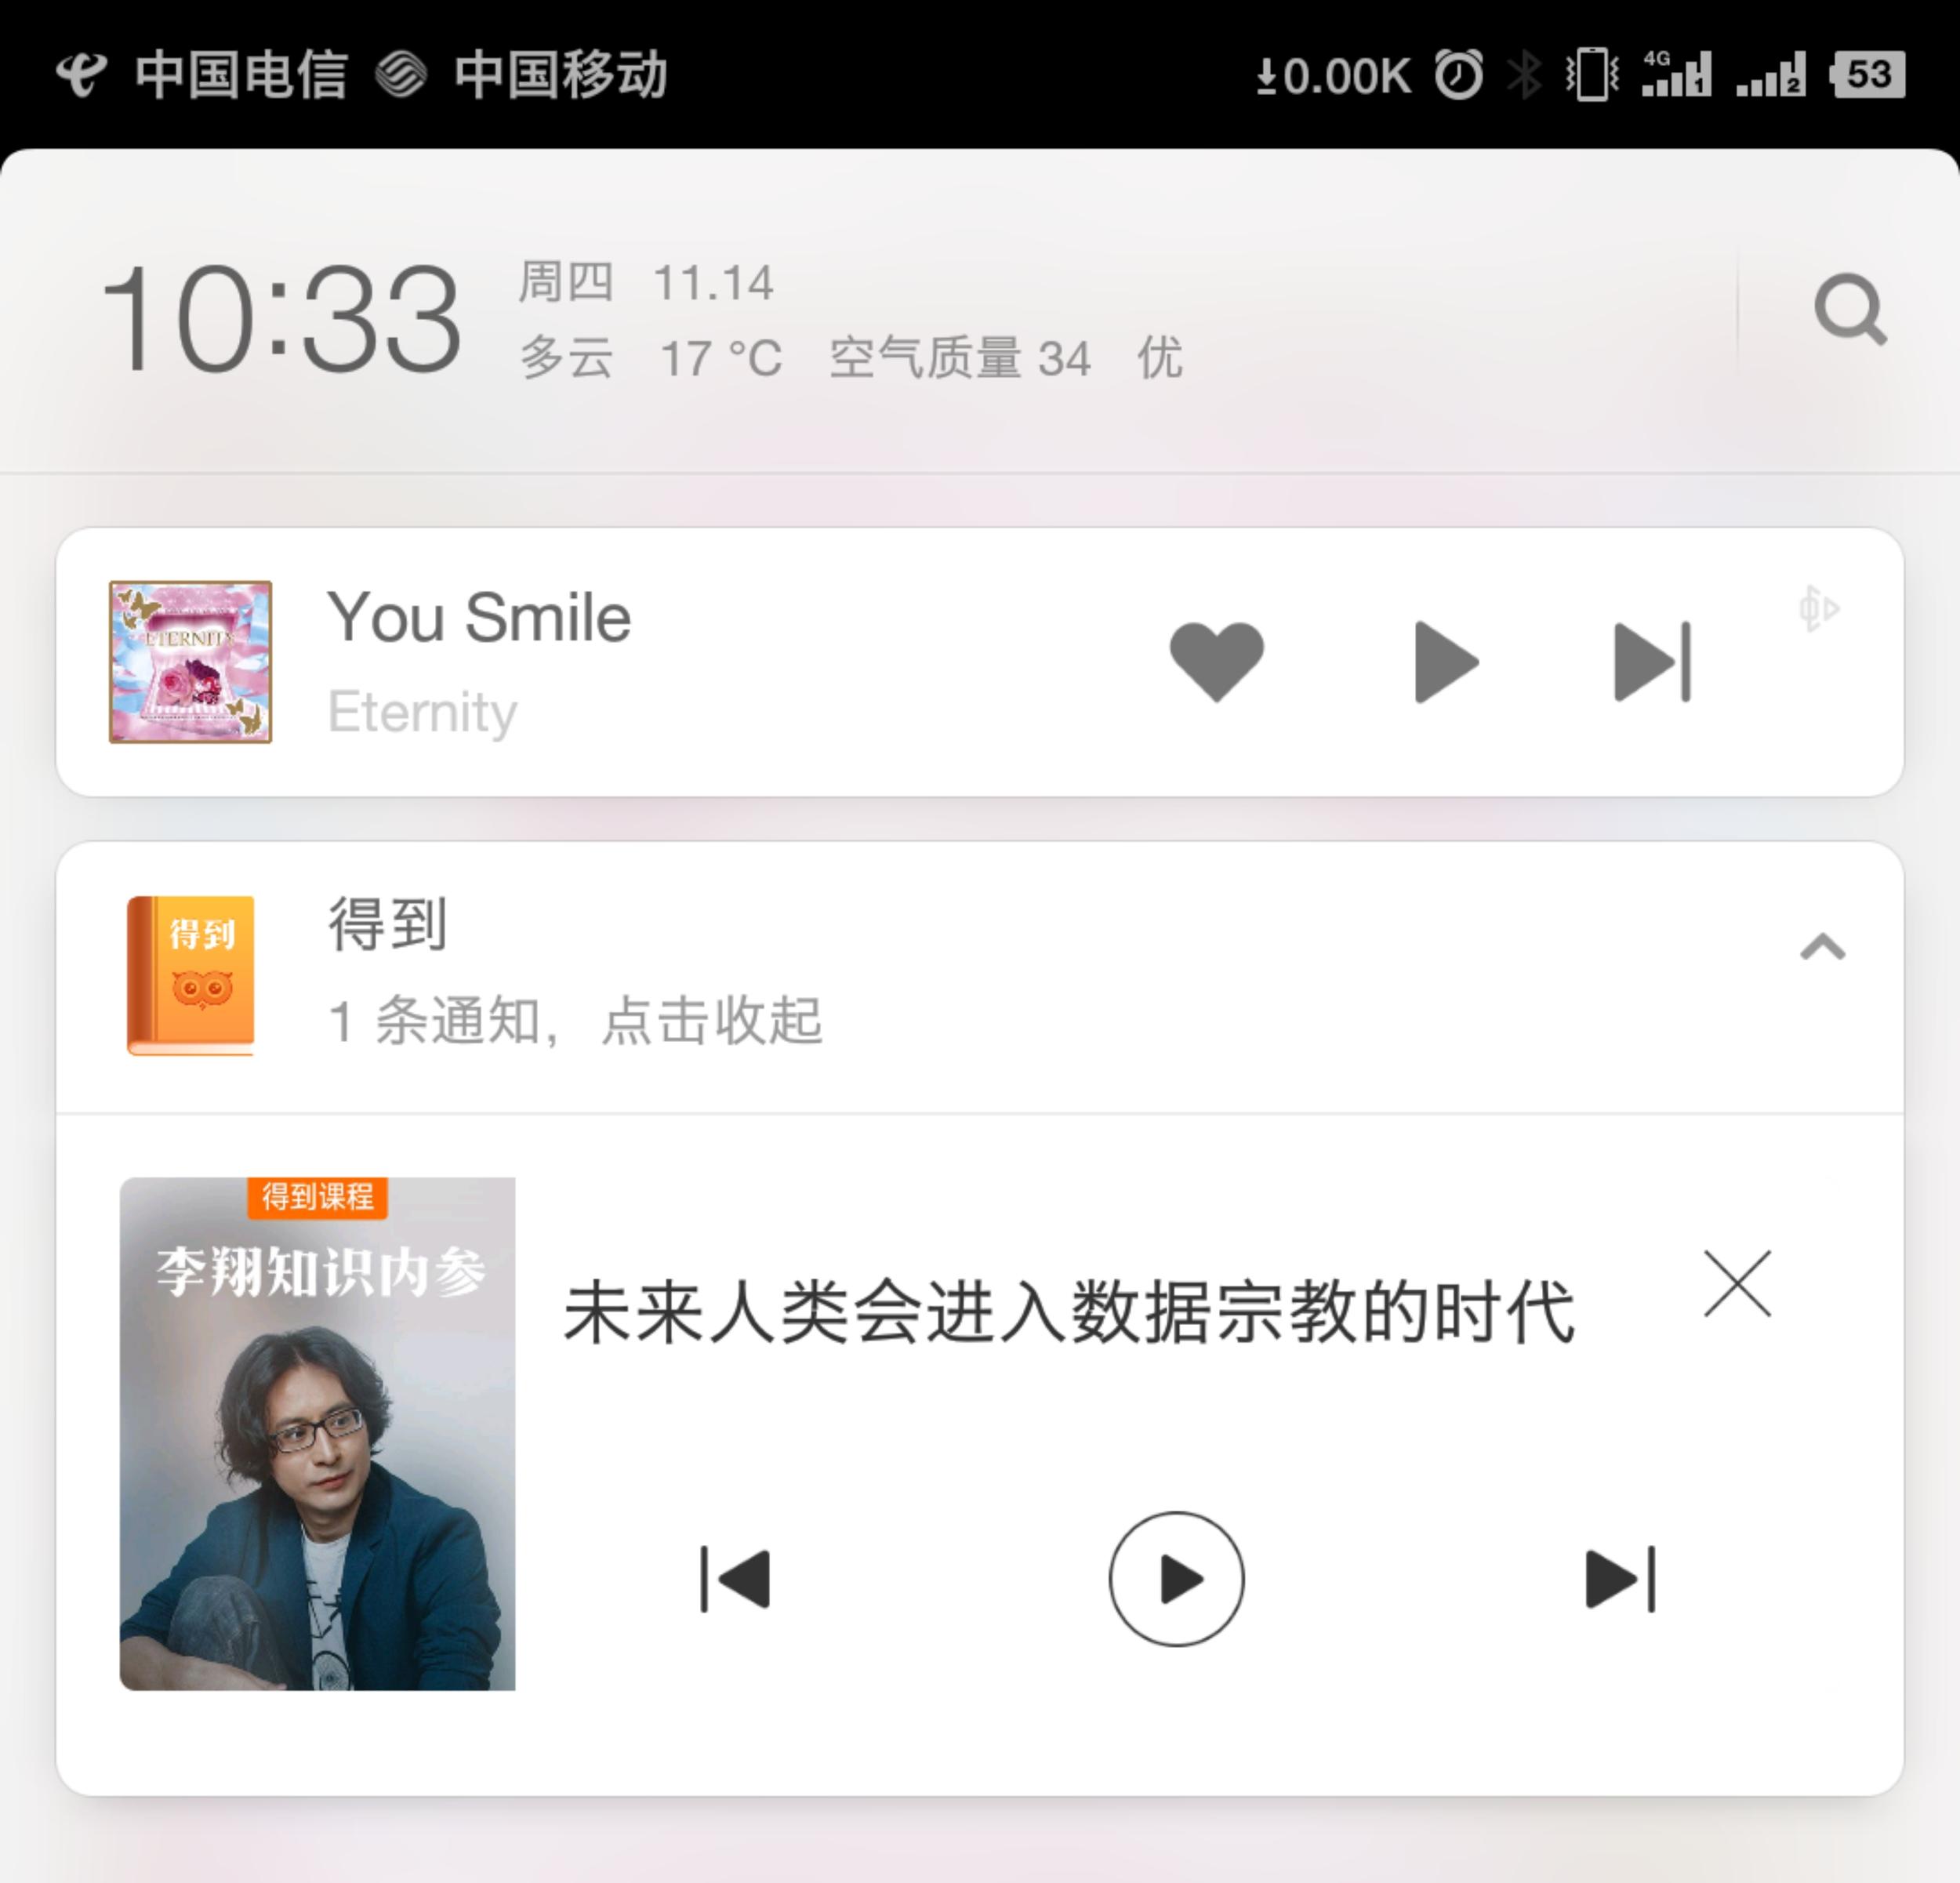 Screenshot_2019-11-14-10-33-59-201.png